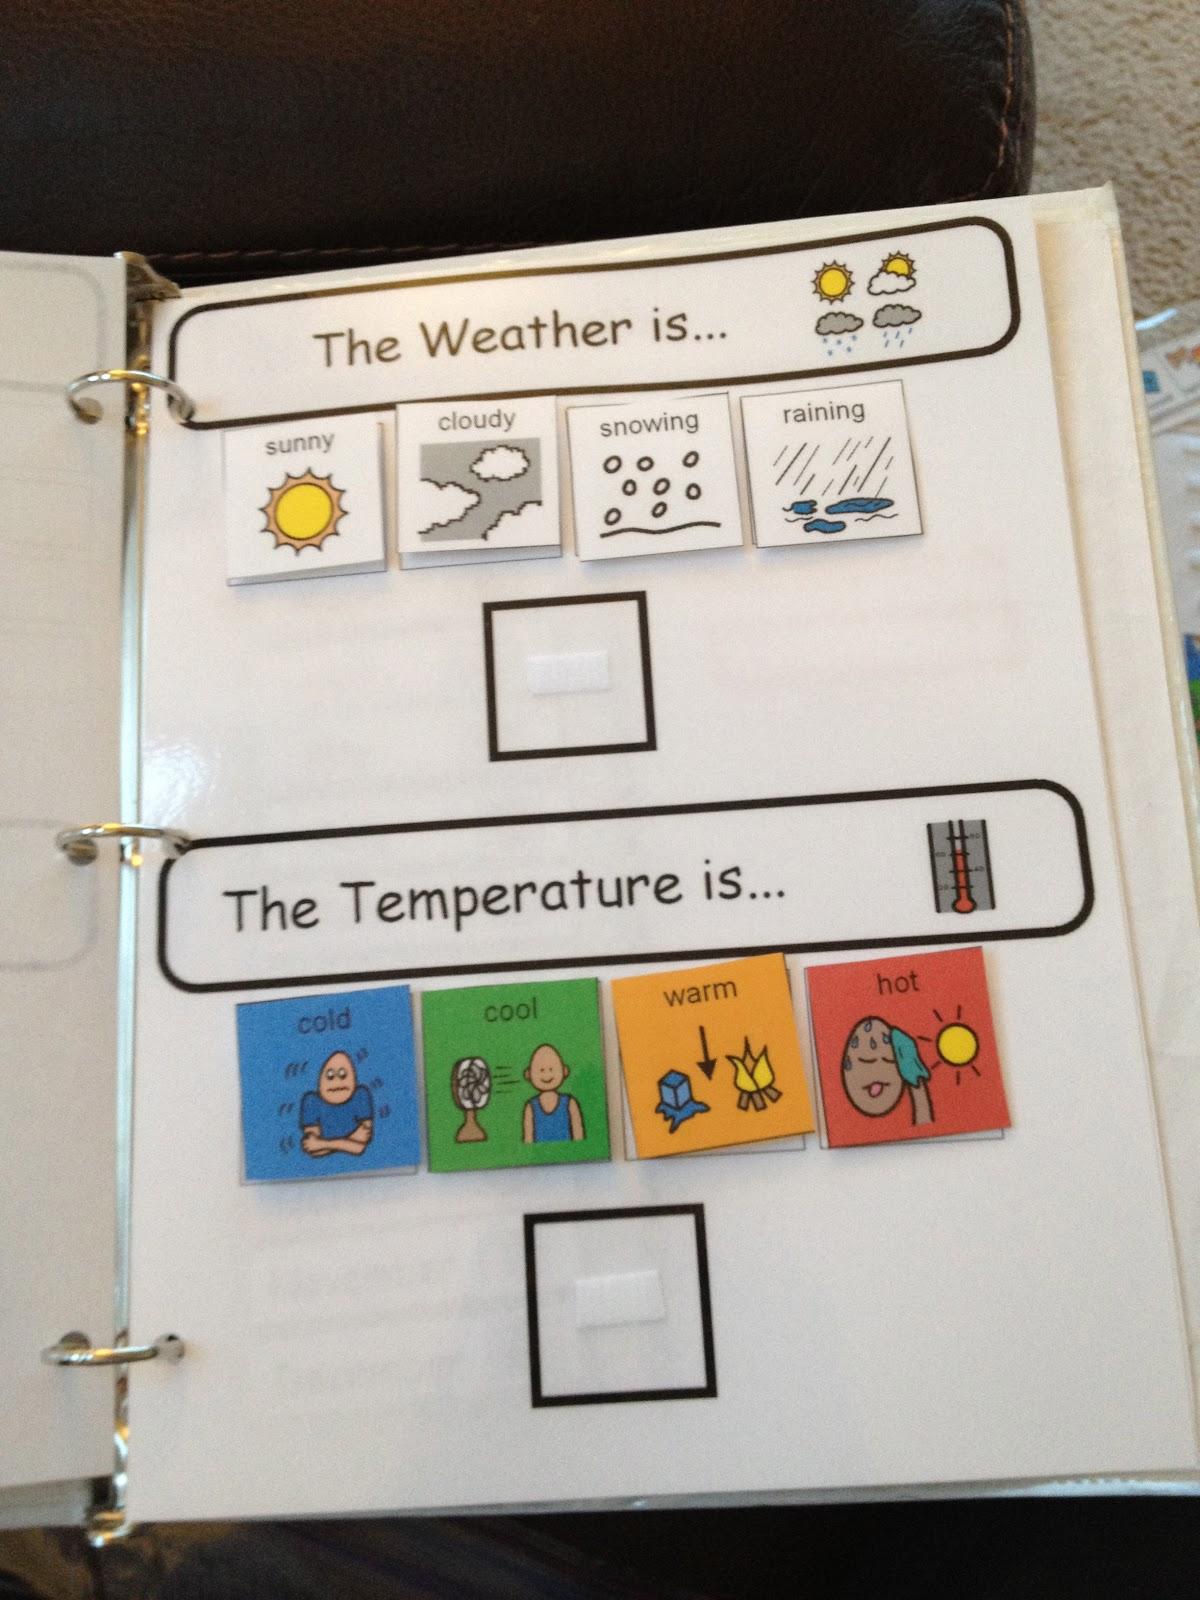 weather kingfield me today i will do my homework